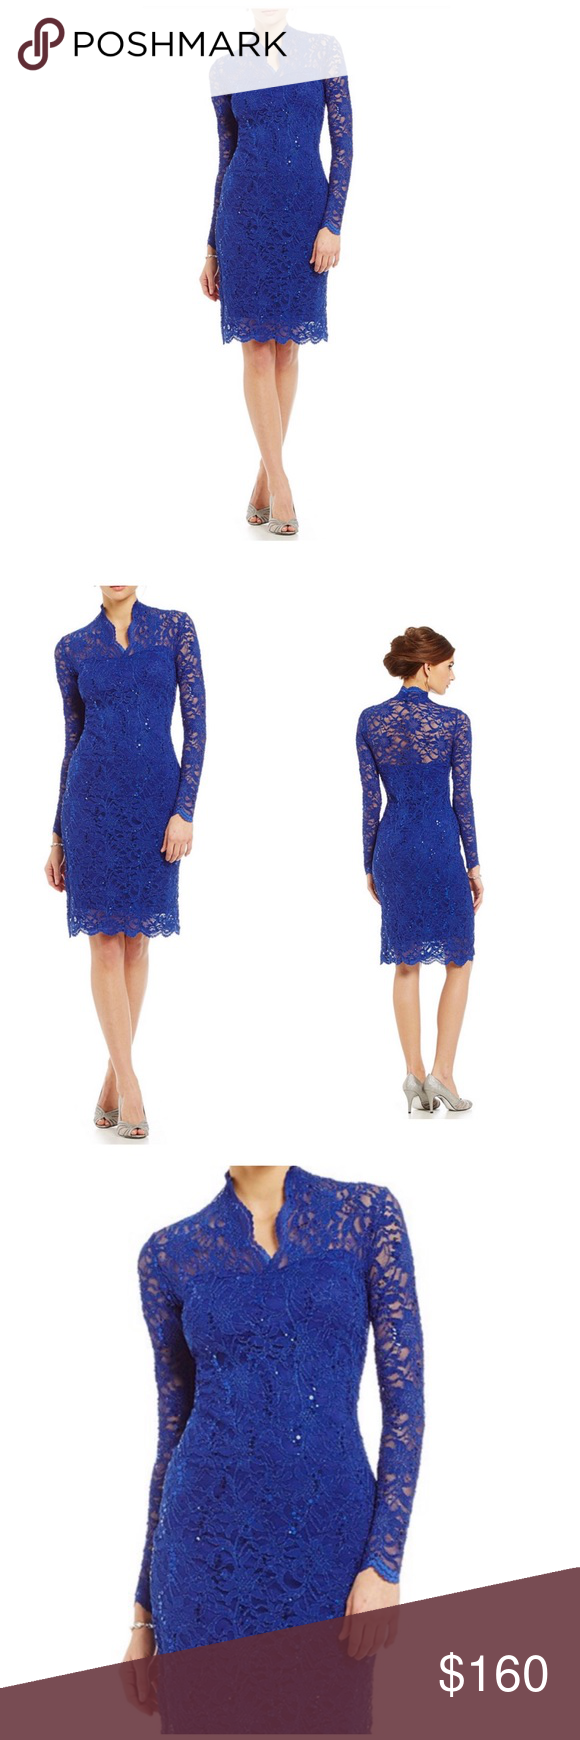 098ec20b Marina Long-Sleeve Sequin Lace Dress Royal Marina Long-Sleeve Sequin Lace  Dress Royal